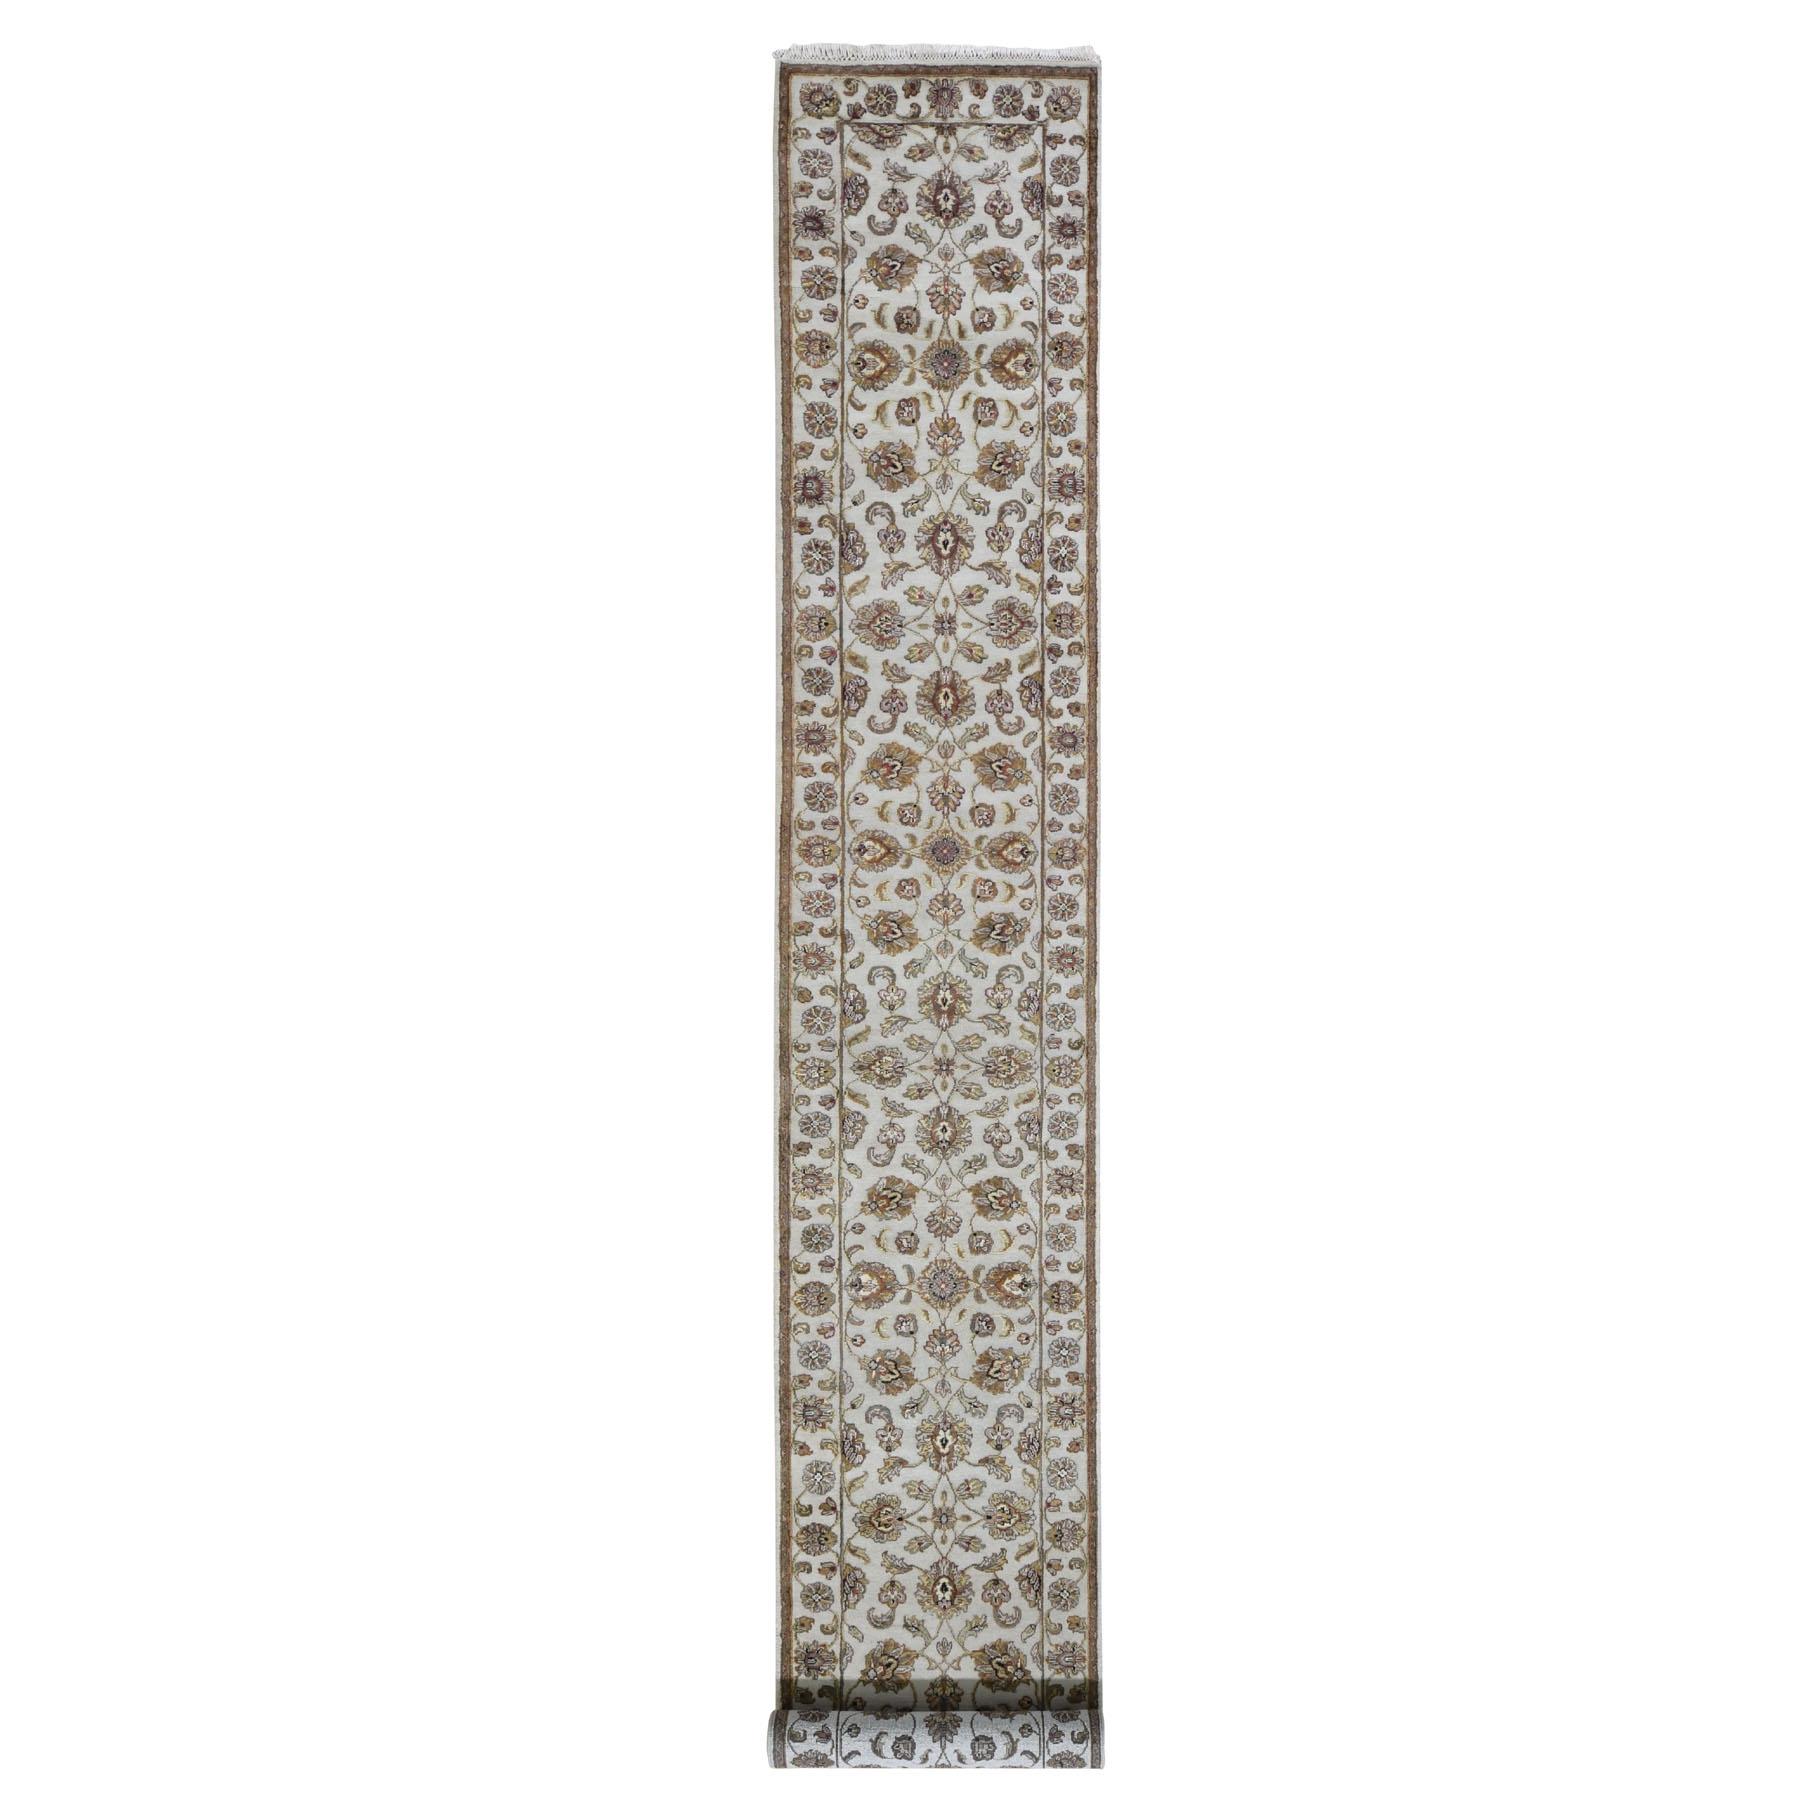 "2'7""x16' Half Wool And Half Silk Rajasthan Hand Knotted XL Runner Oriental Rug"